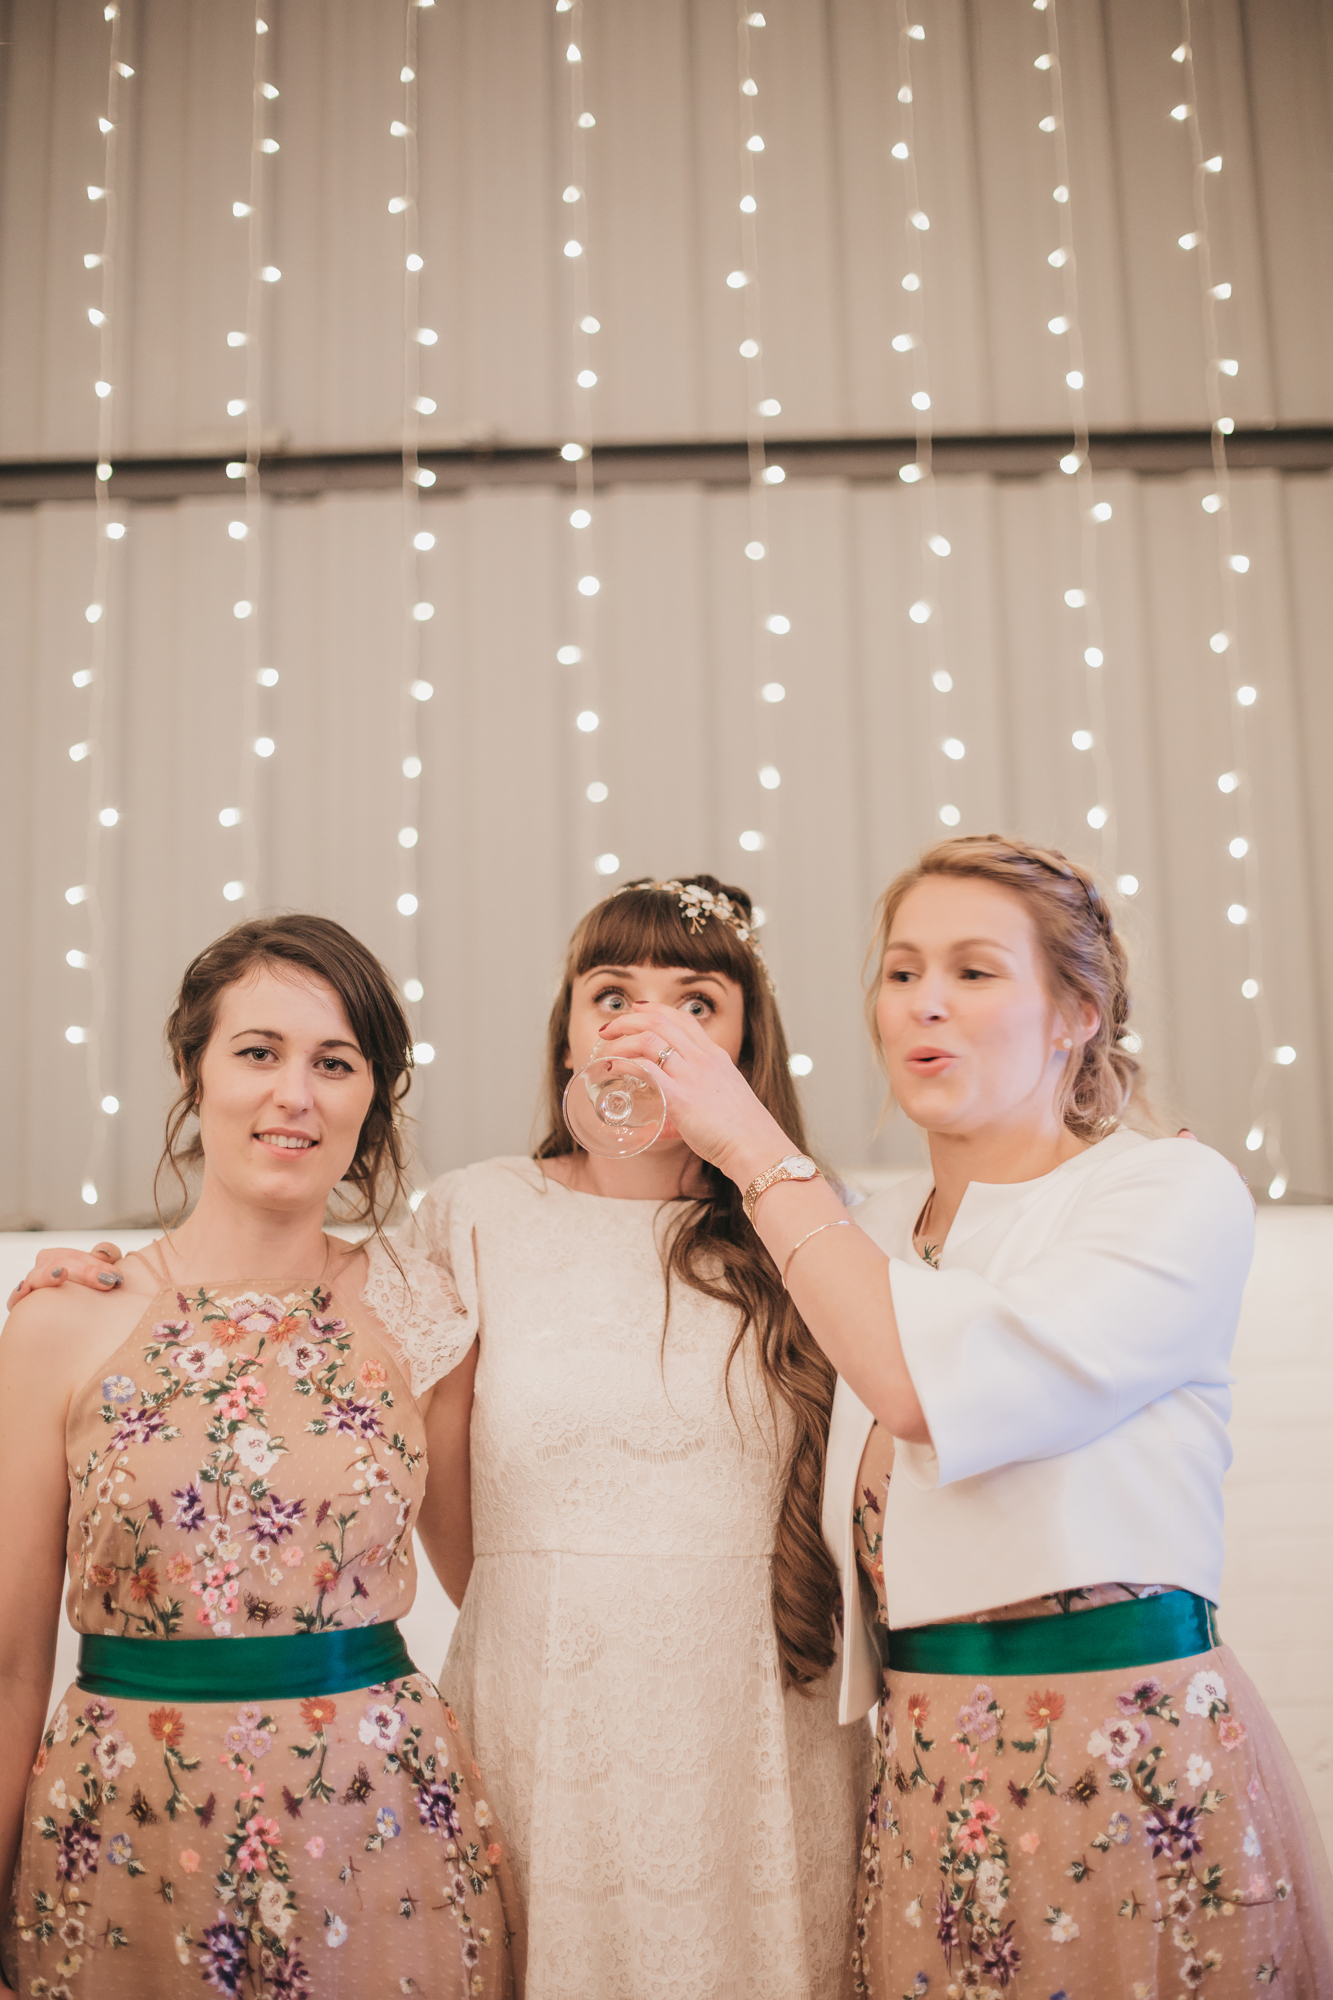 Kristy-Back-Garden-Outdoor-Wedding-Sheffield-Industrial-Warehouse-Wedding-Bohemian-Kate-Beaumont-Dahlia-Dress-51.jpg